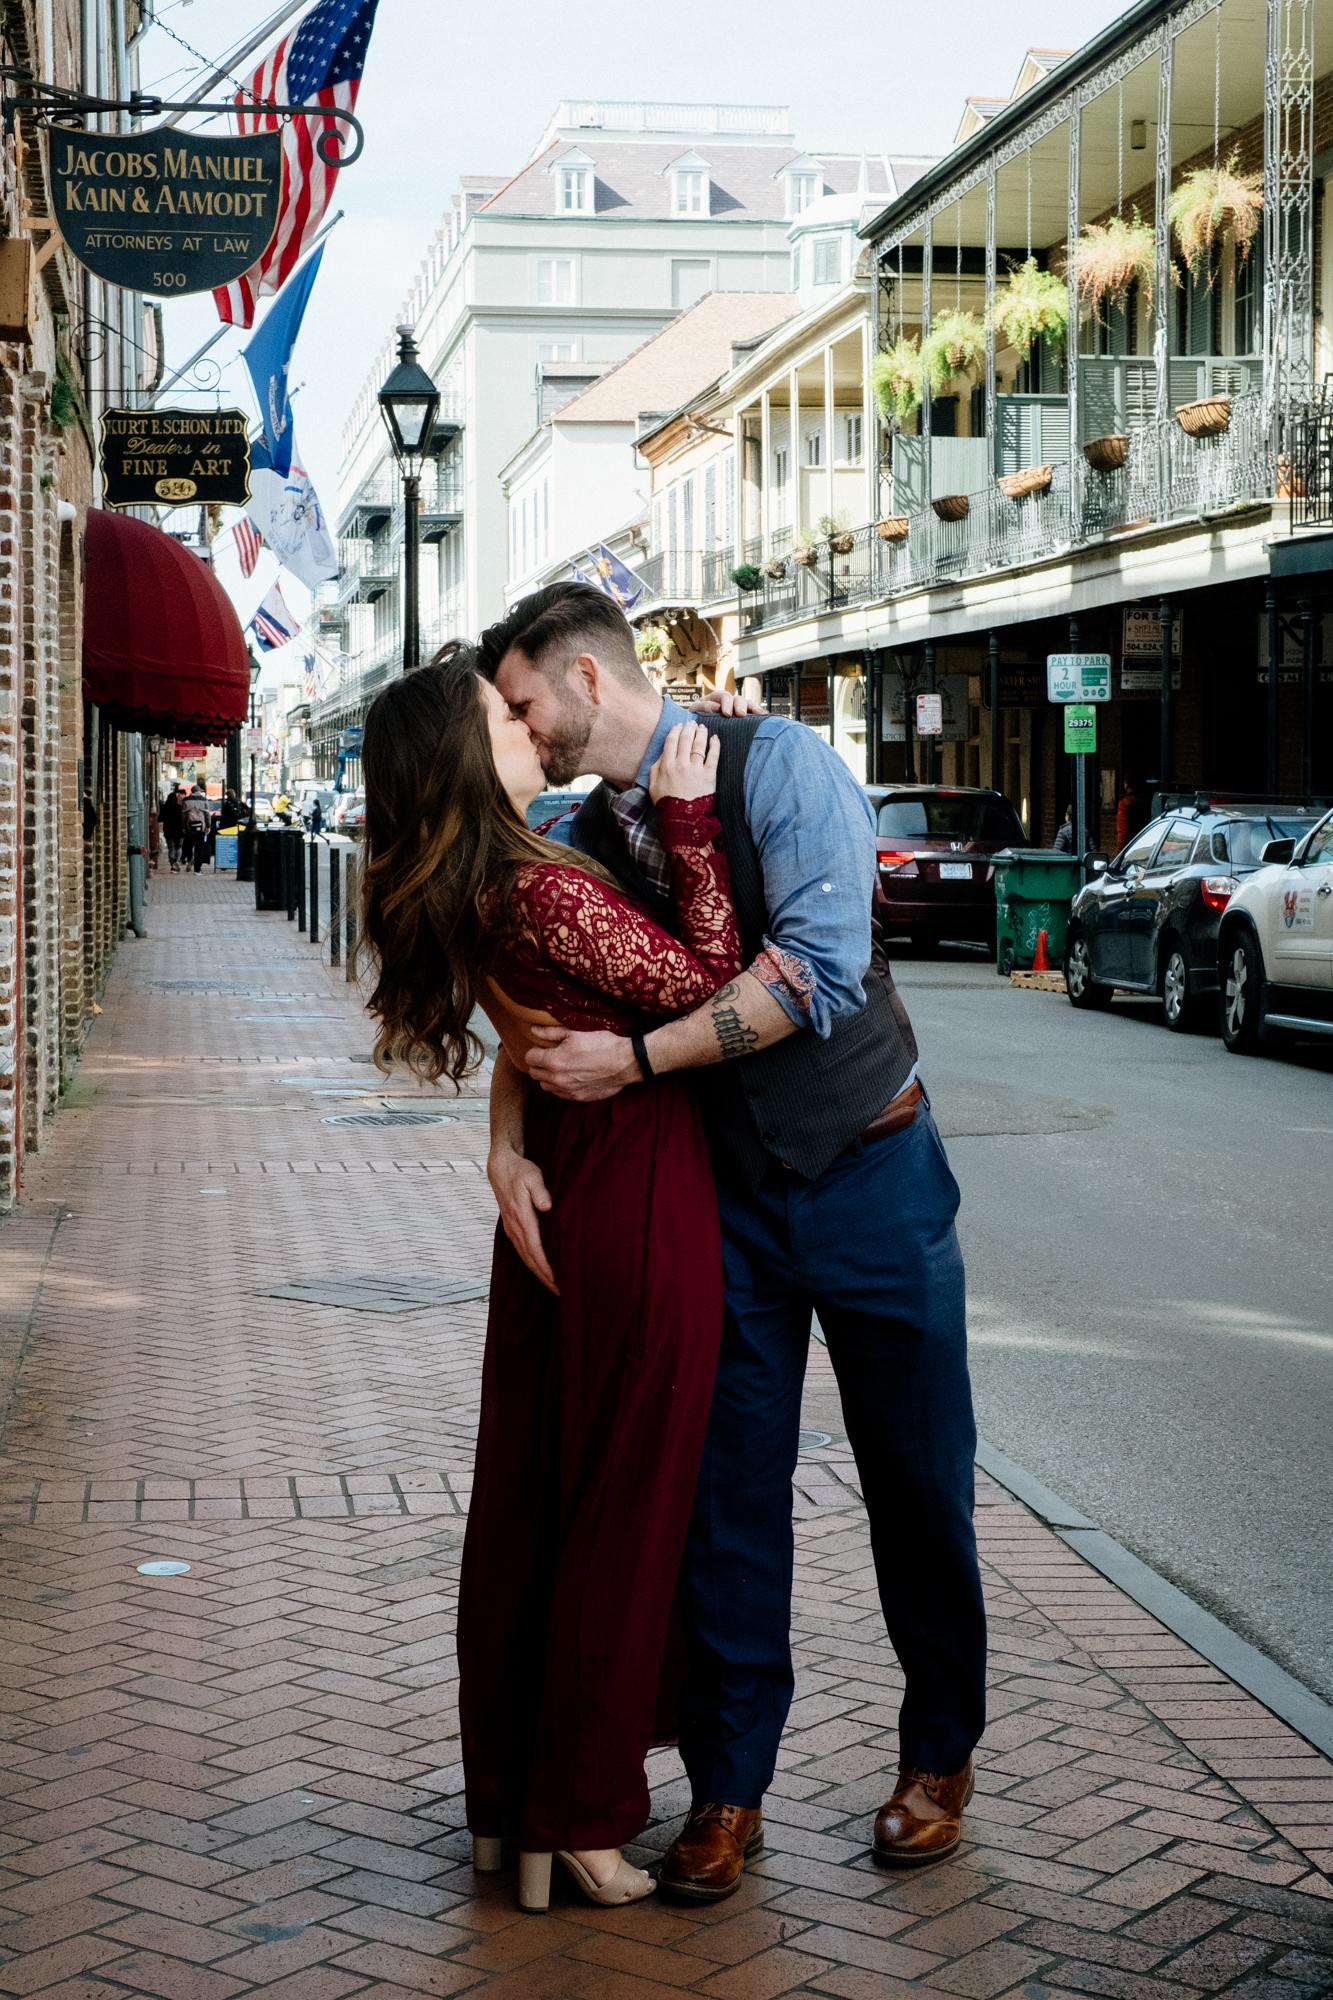 Jen_Montgomery_Photography_Angela_Brian_Engagement_Proposal_FB-61.jpg